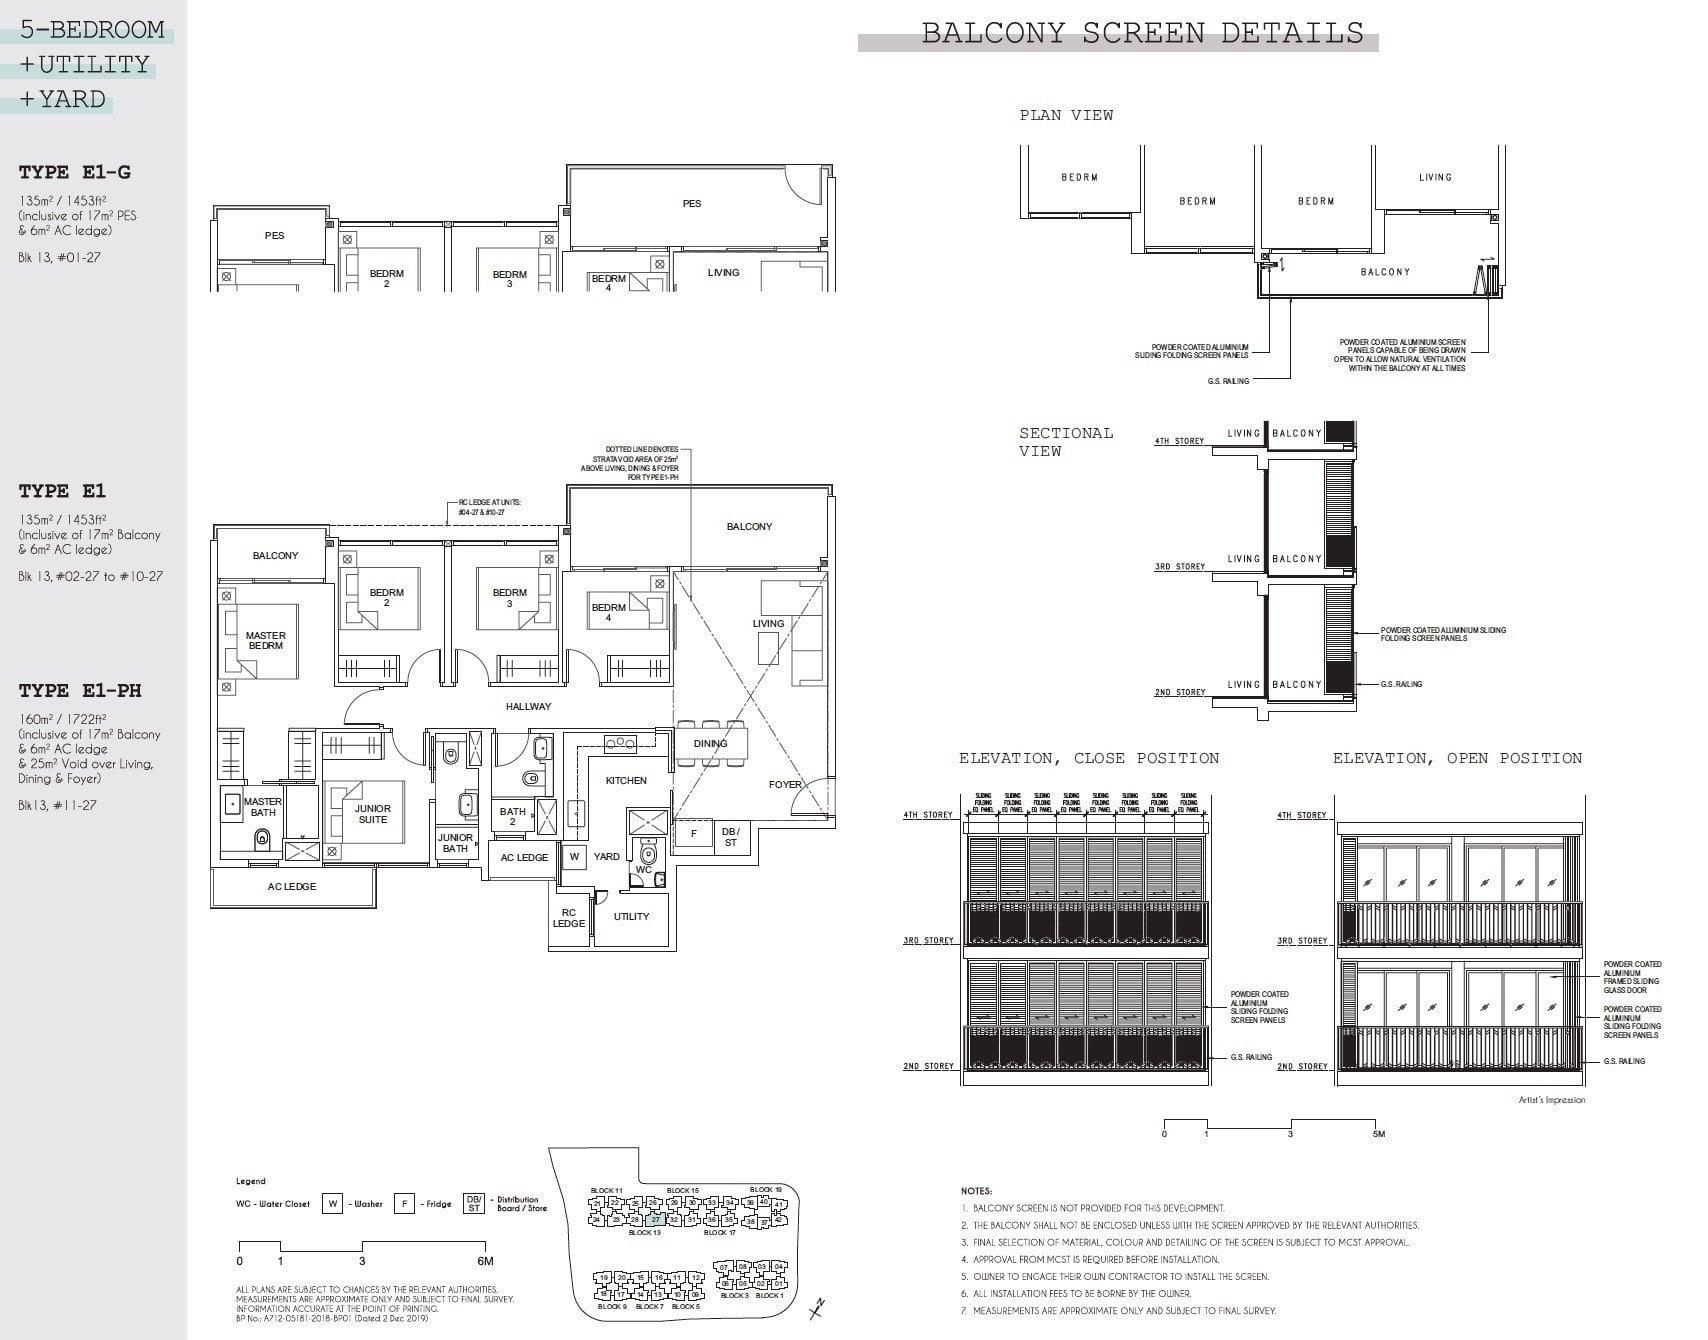 Parc Canberra floor plan floor plan 5BR